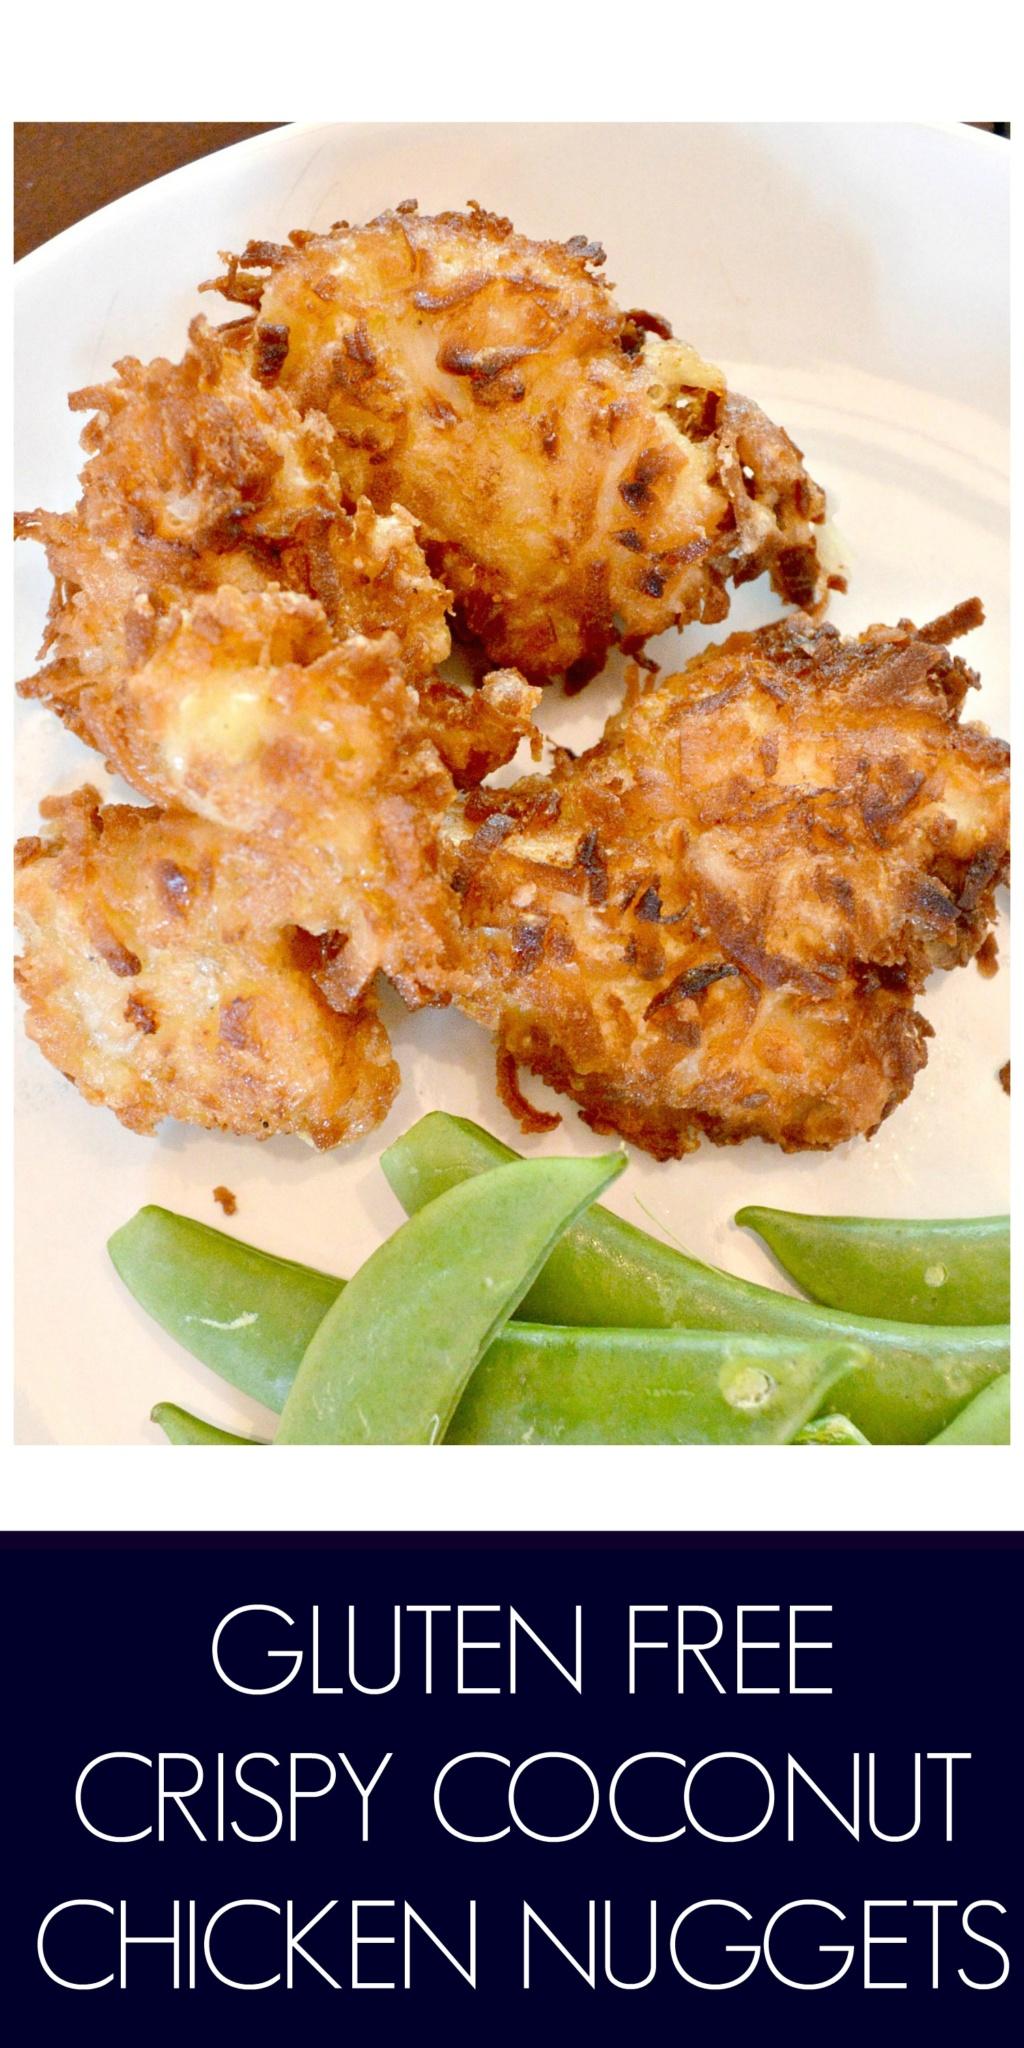 I Tried It – Gluten Free Crispy Coconut Chicken Nuggets